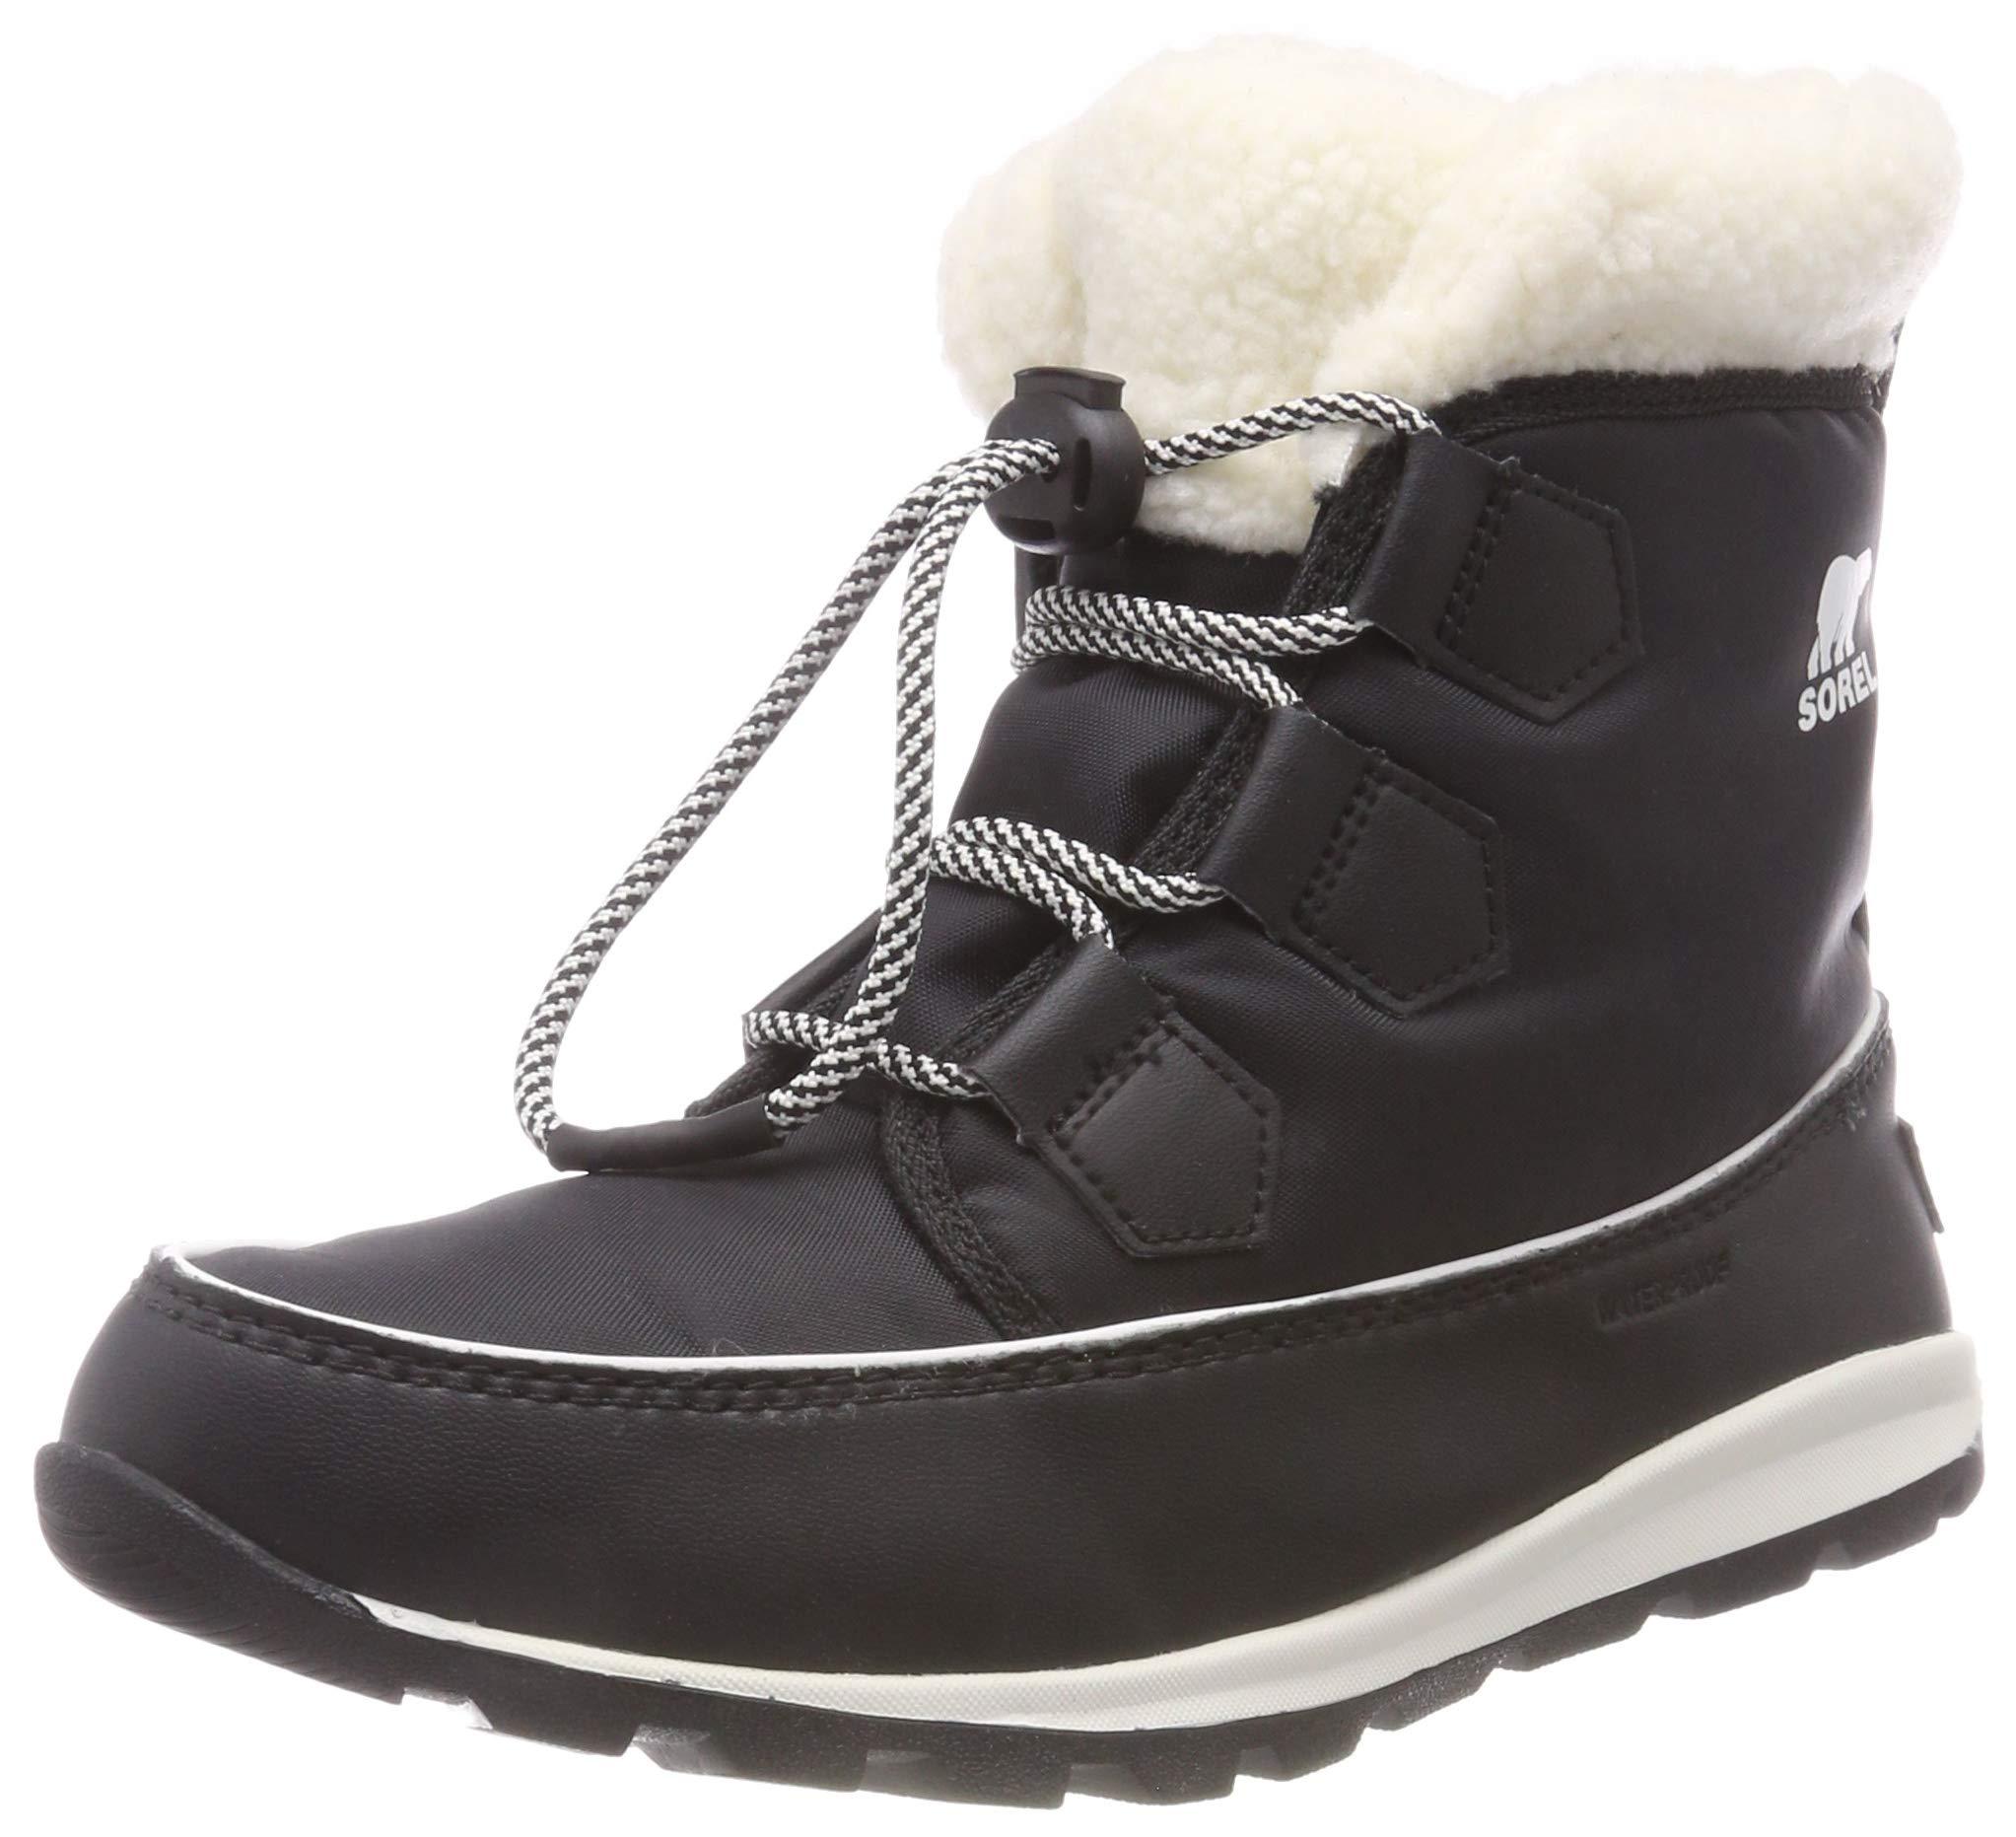 Sorel Girls' Youth Whitney Carnival Snow Boot, Black, sea Salt, 2 M US Big Kid